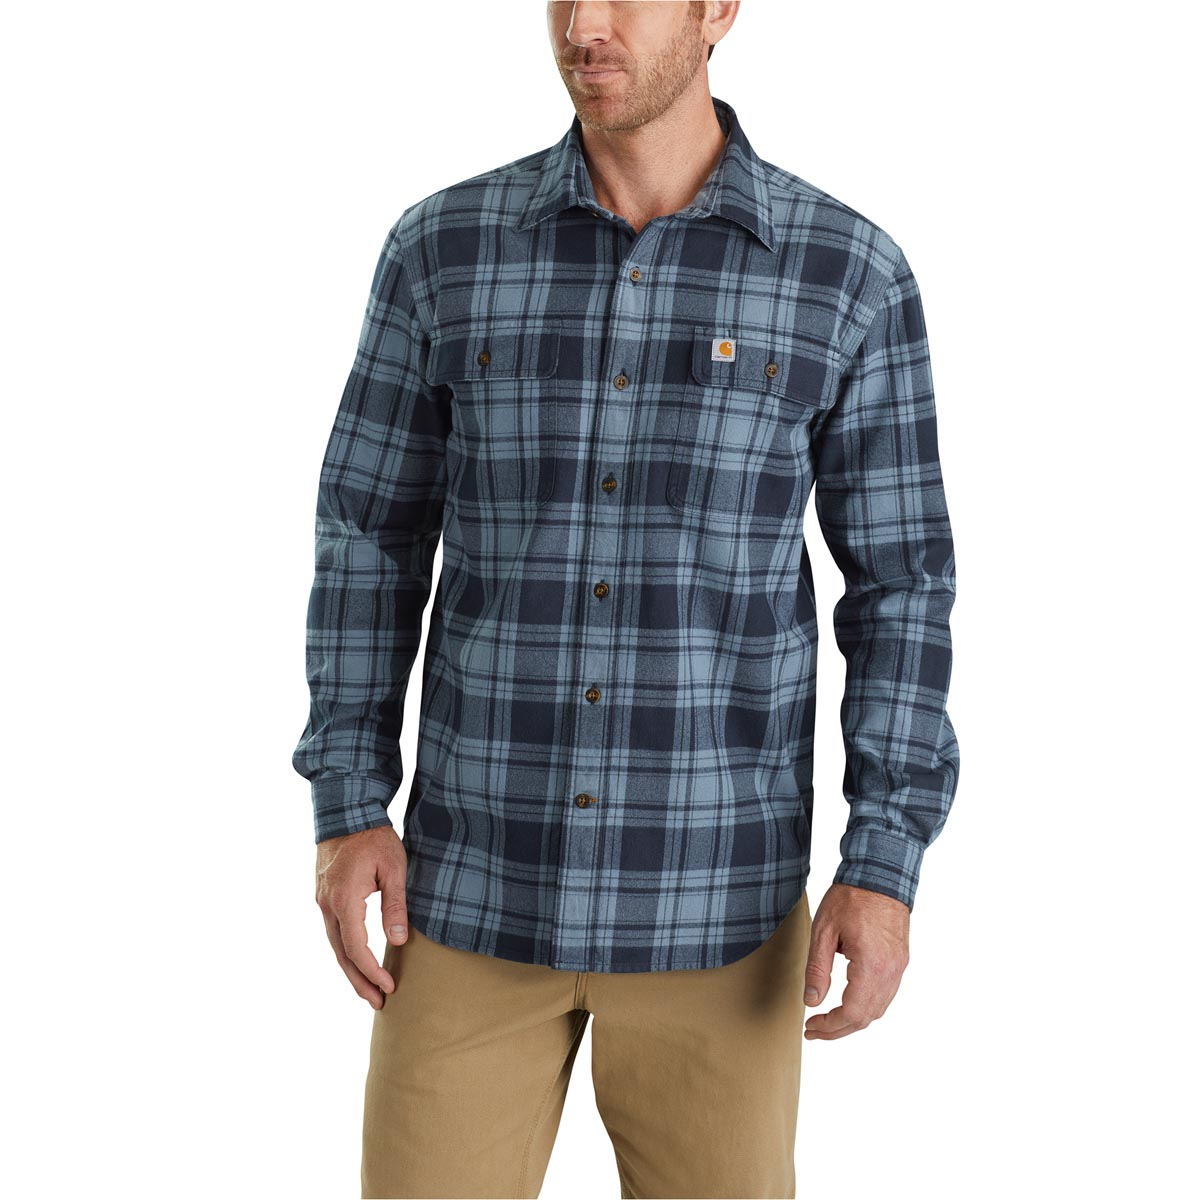 fbb8114dd5d90a Carhartt Men's Hubbard Plaid Shirt - Discontinued Pricing